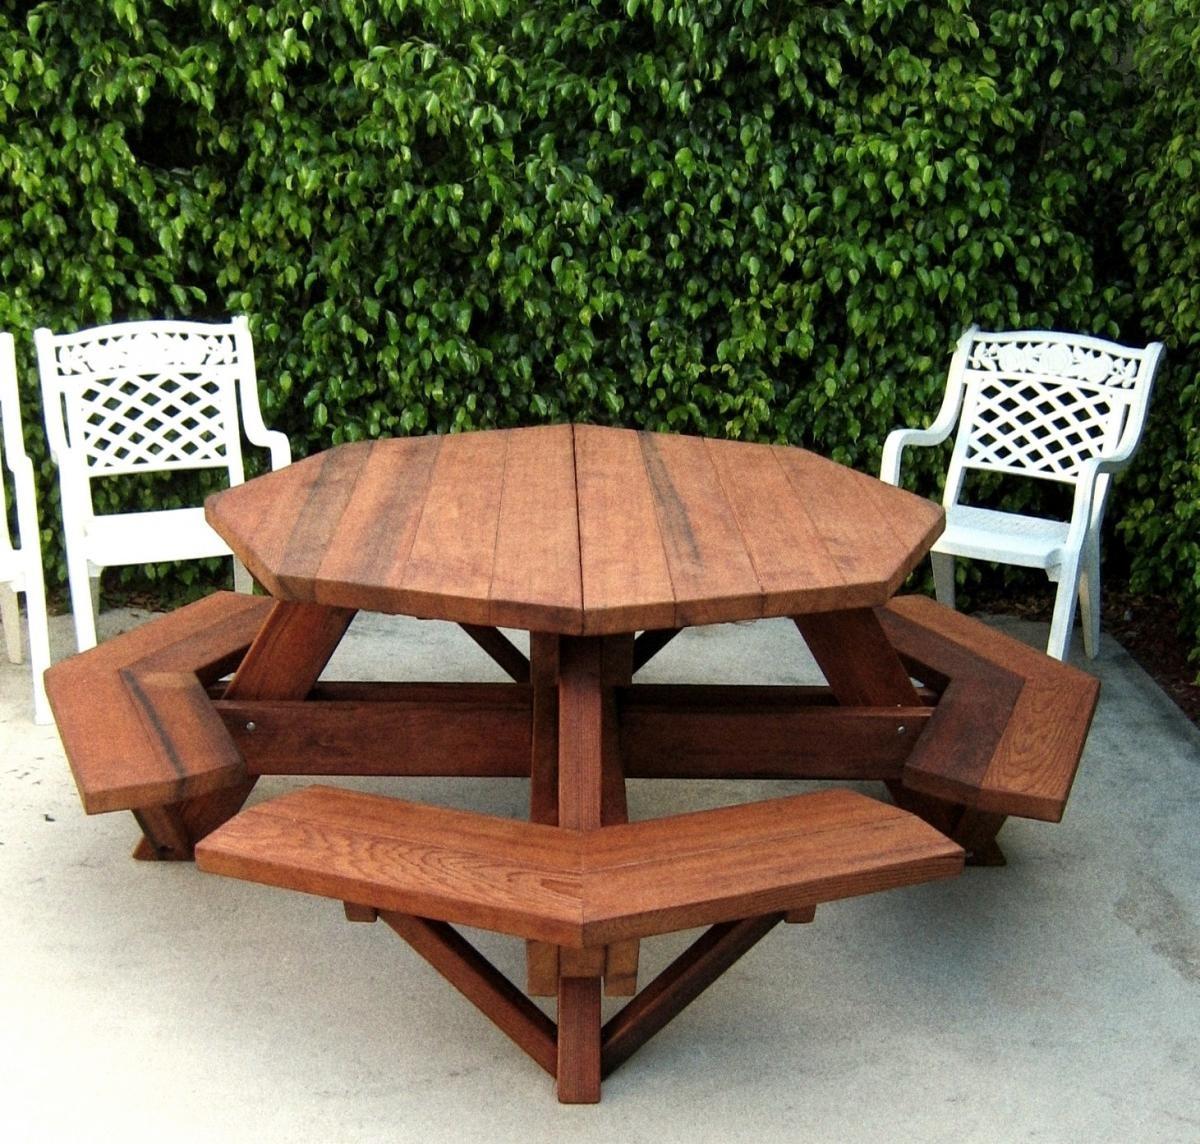 Wood plan get octagonal picnic table plans nz for Octagon picnic table blueprints